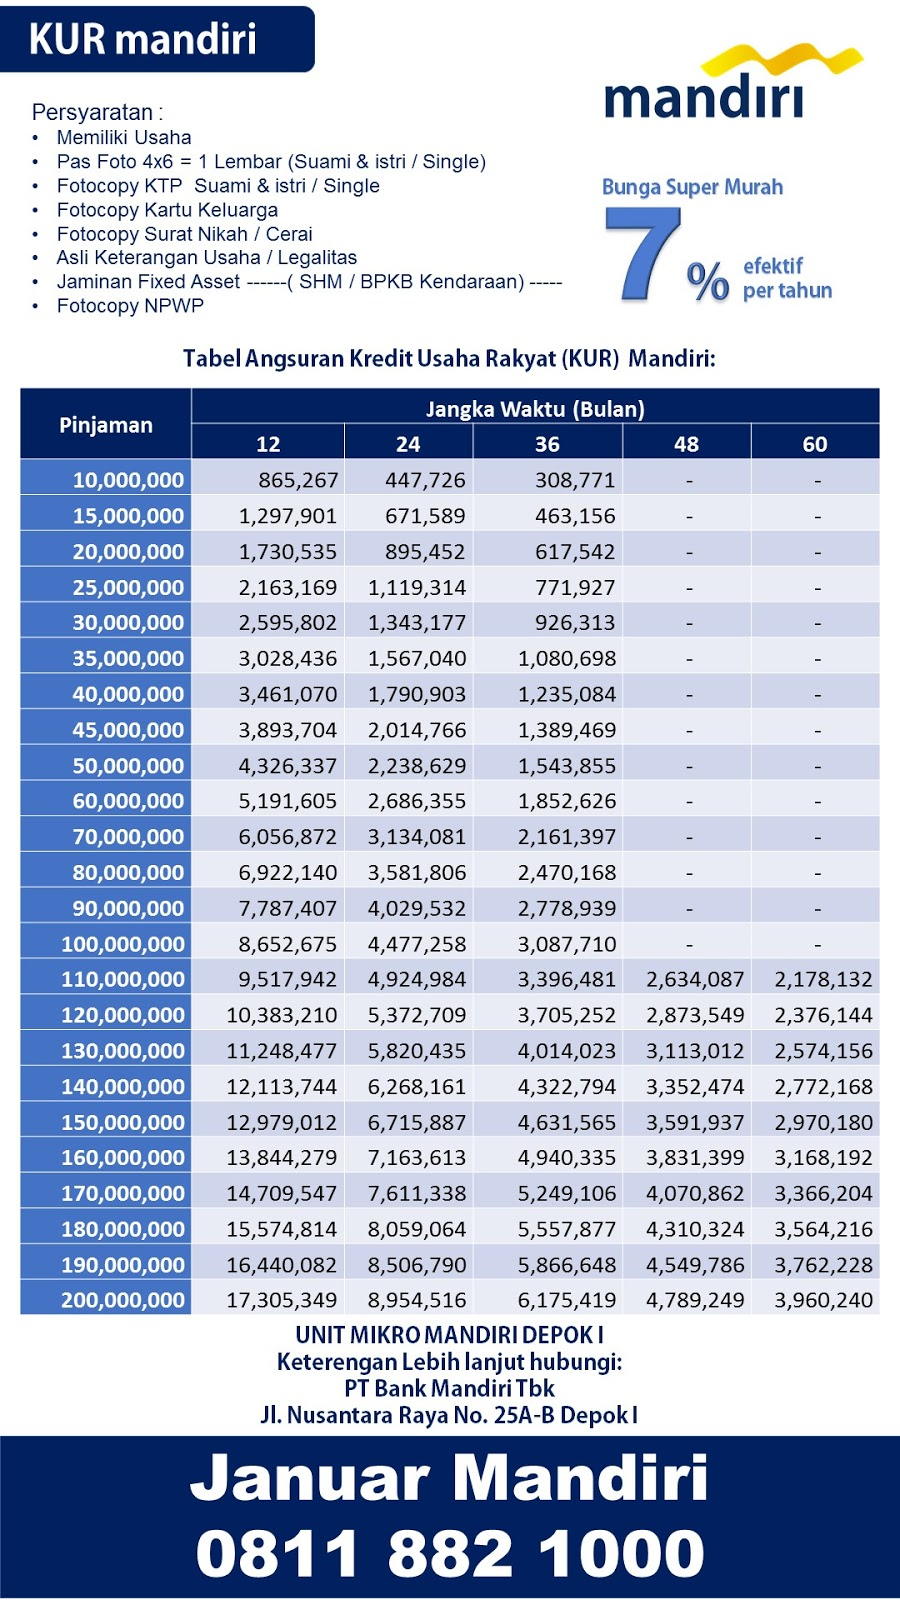 Tabel Angsuran Kredit Usaha Rakyat Kur Bank Mandiri Pinjaman